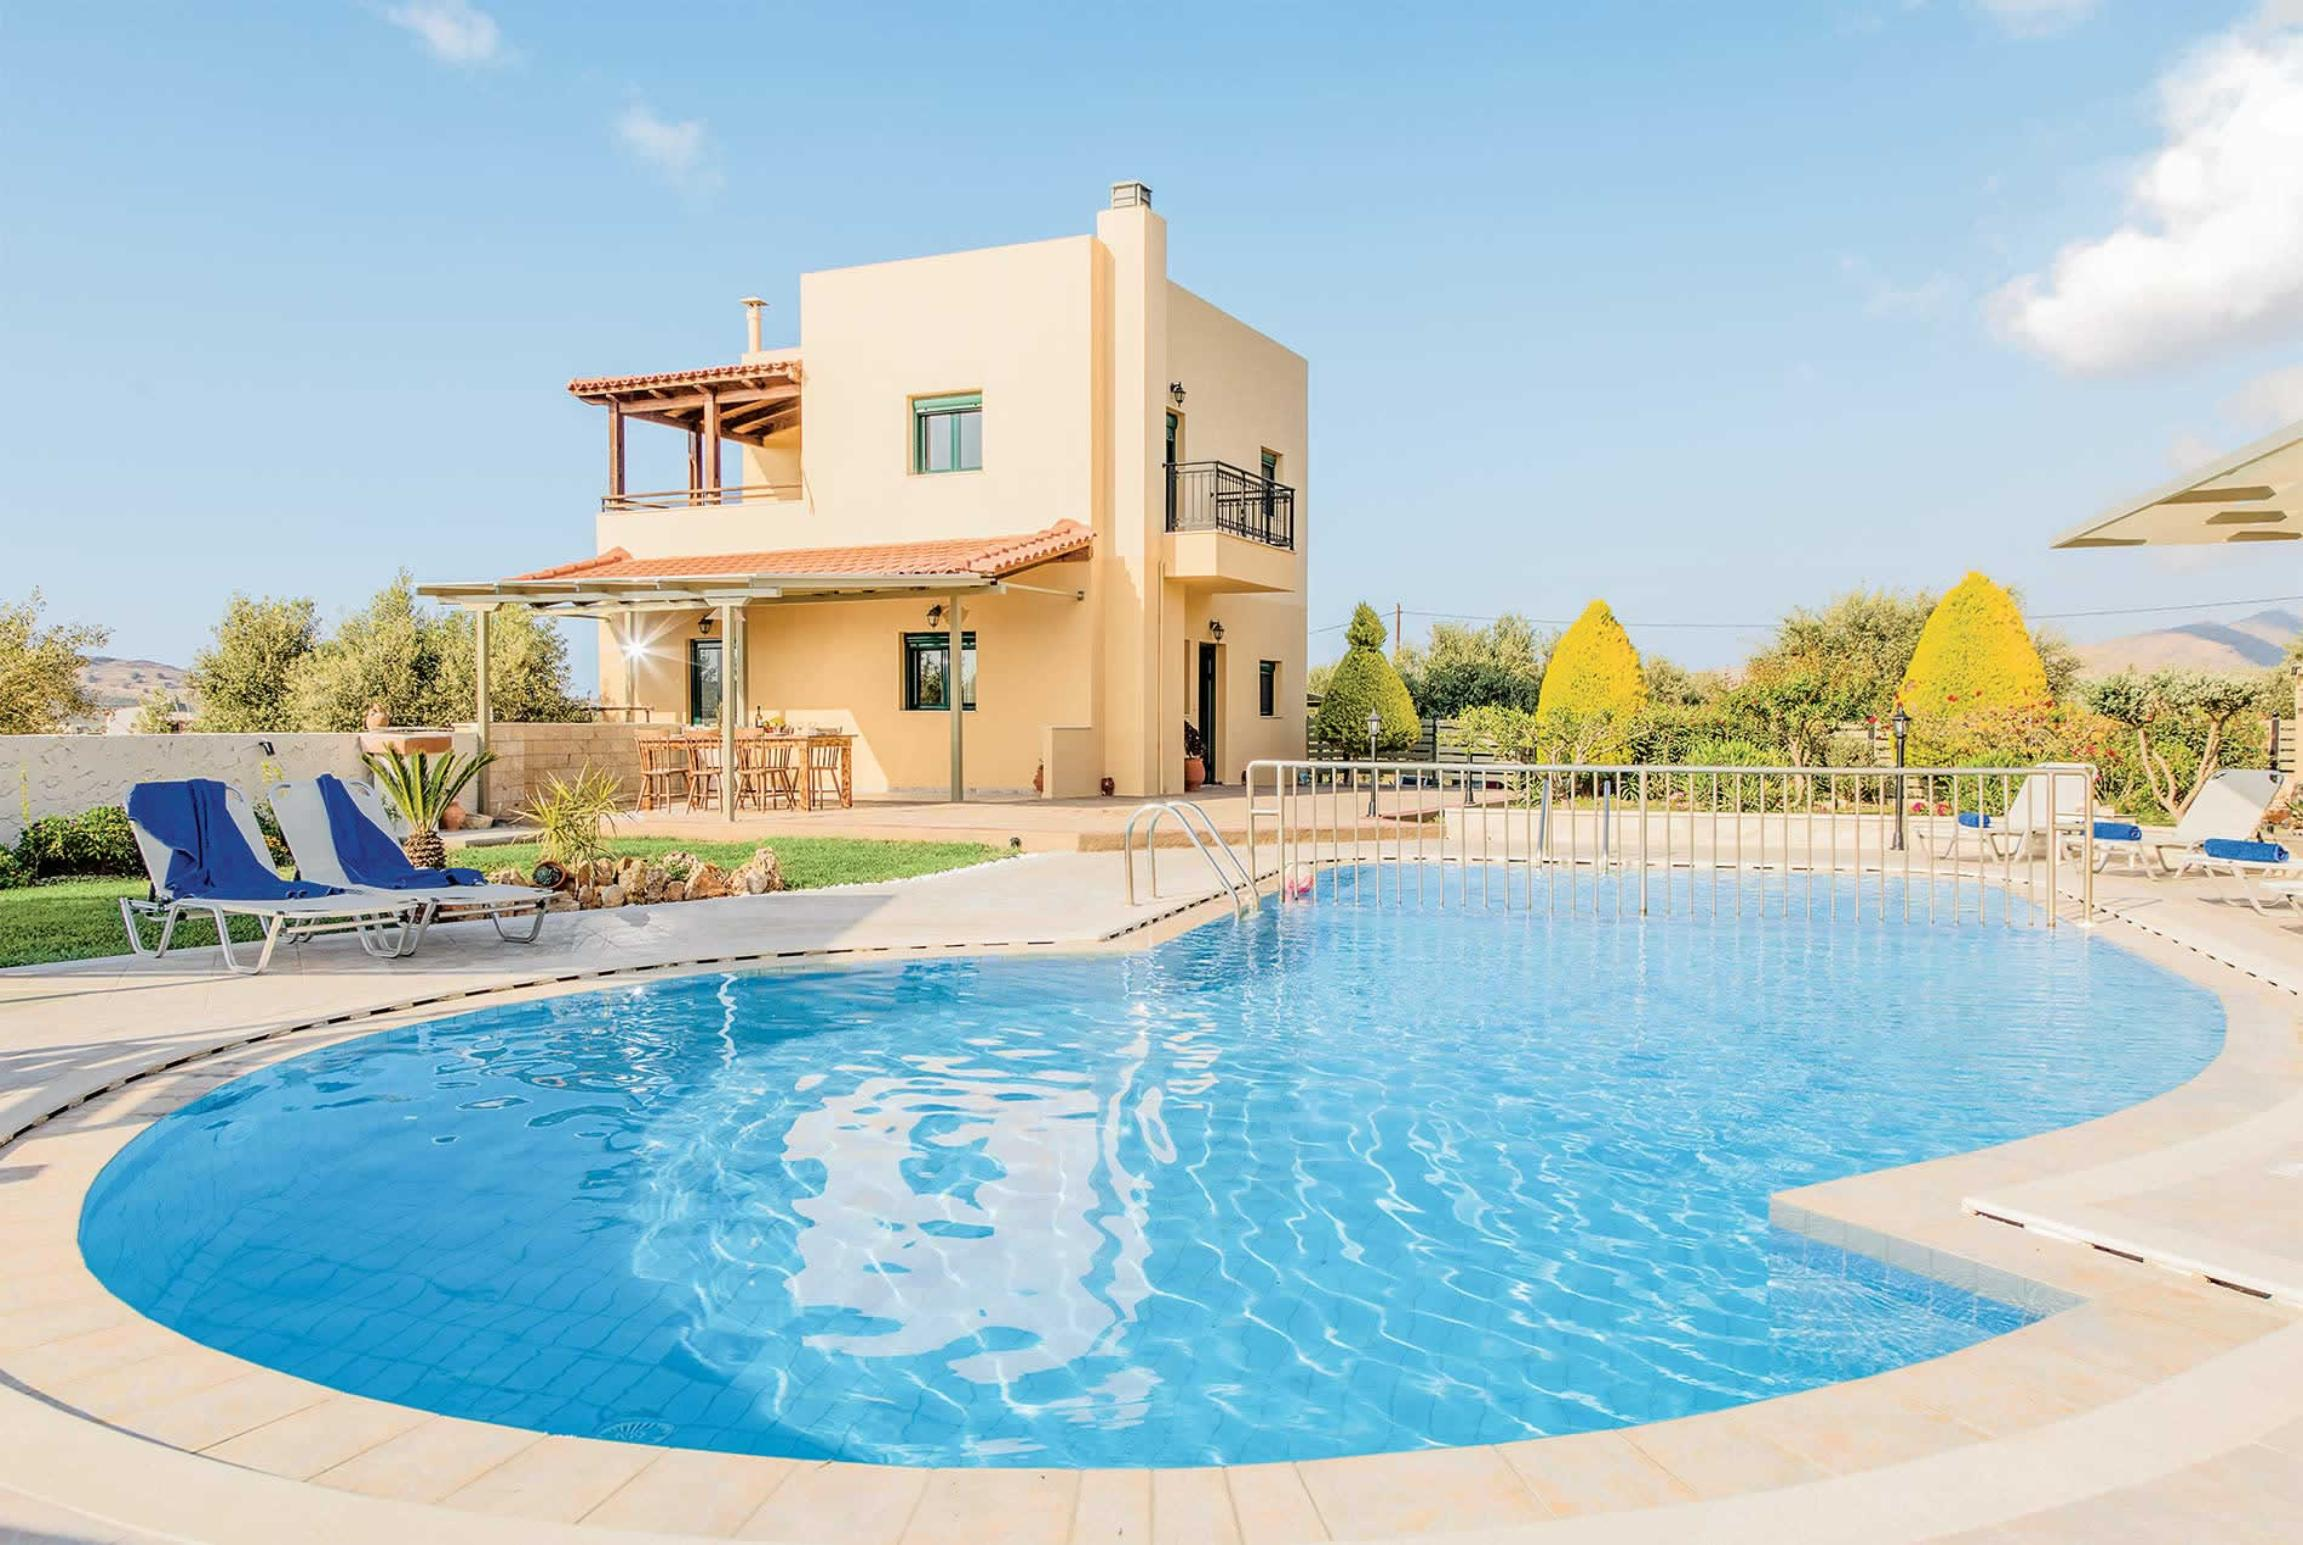 Ferienhaus Dina (2653758), Roumeli, Kreta Nordküste, Kreta, Griechenland, Bild 13